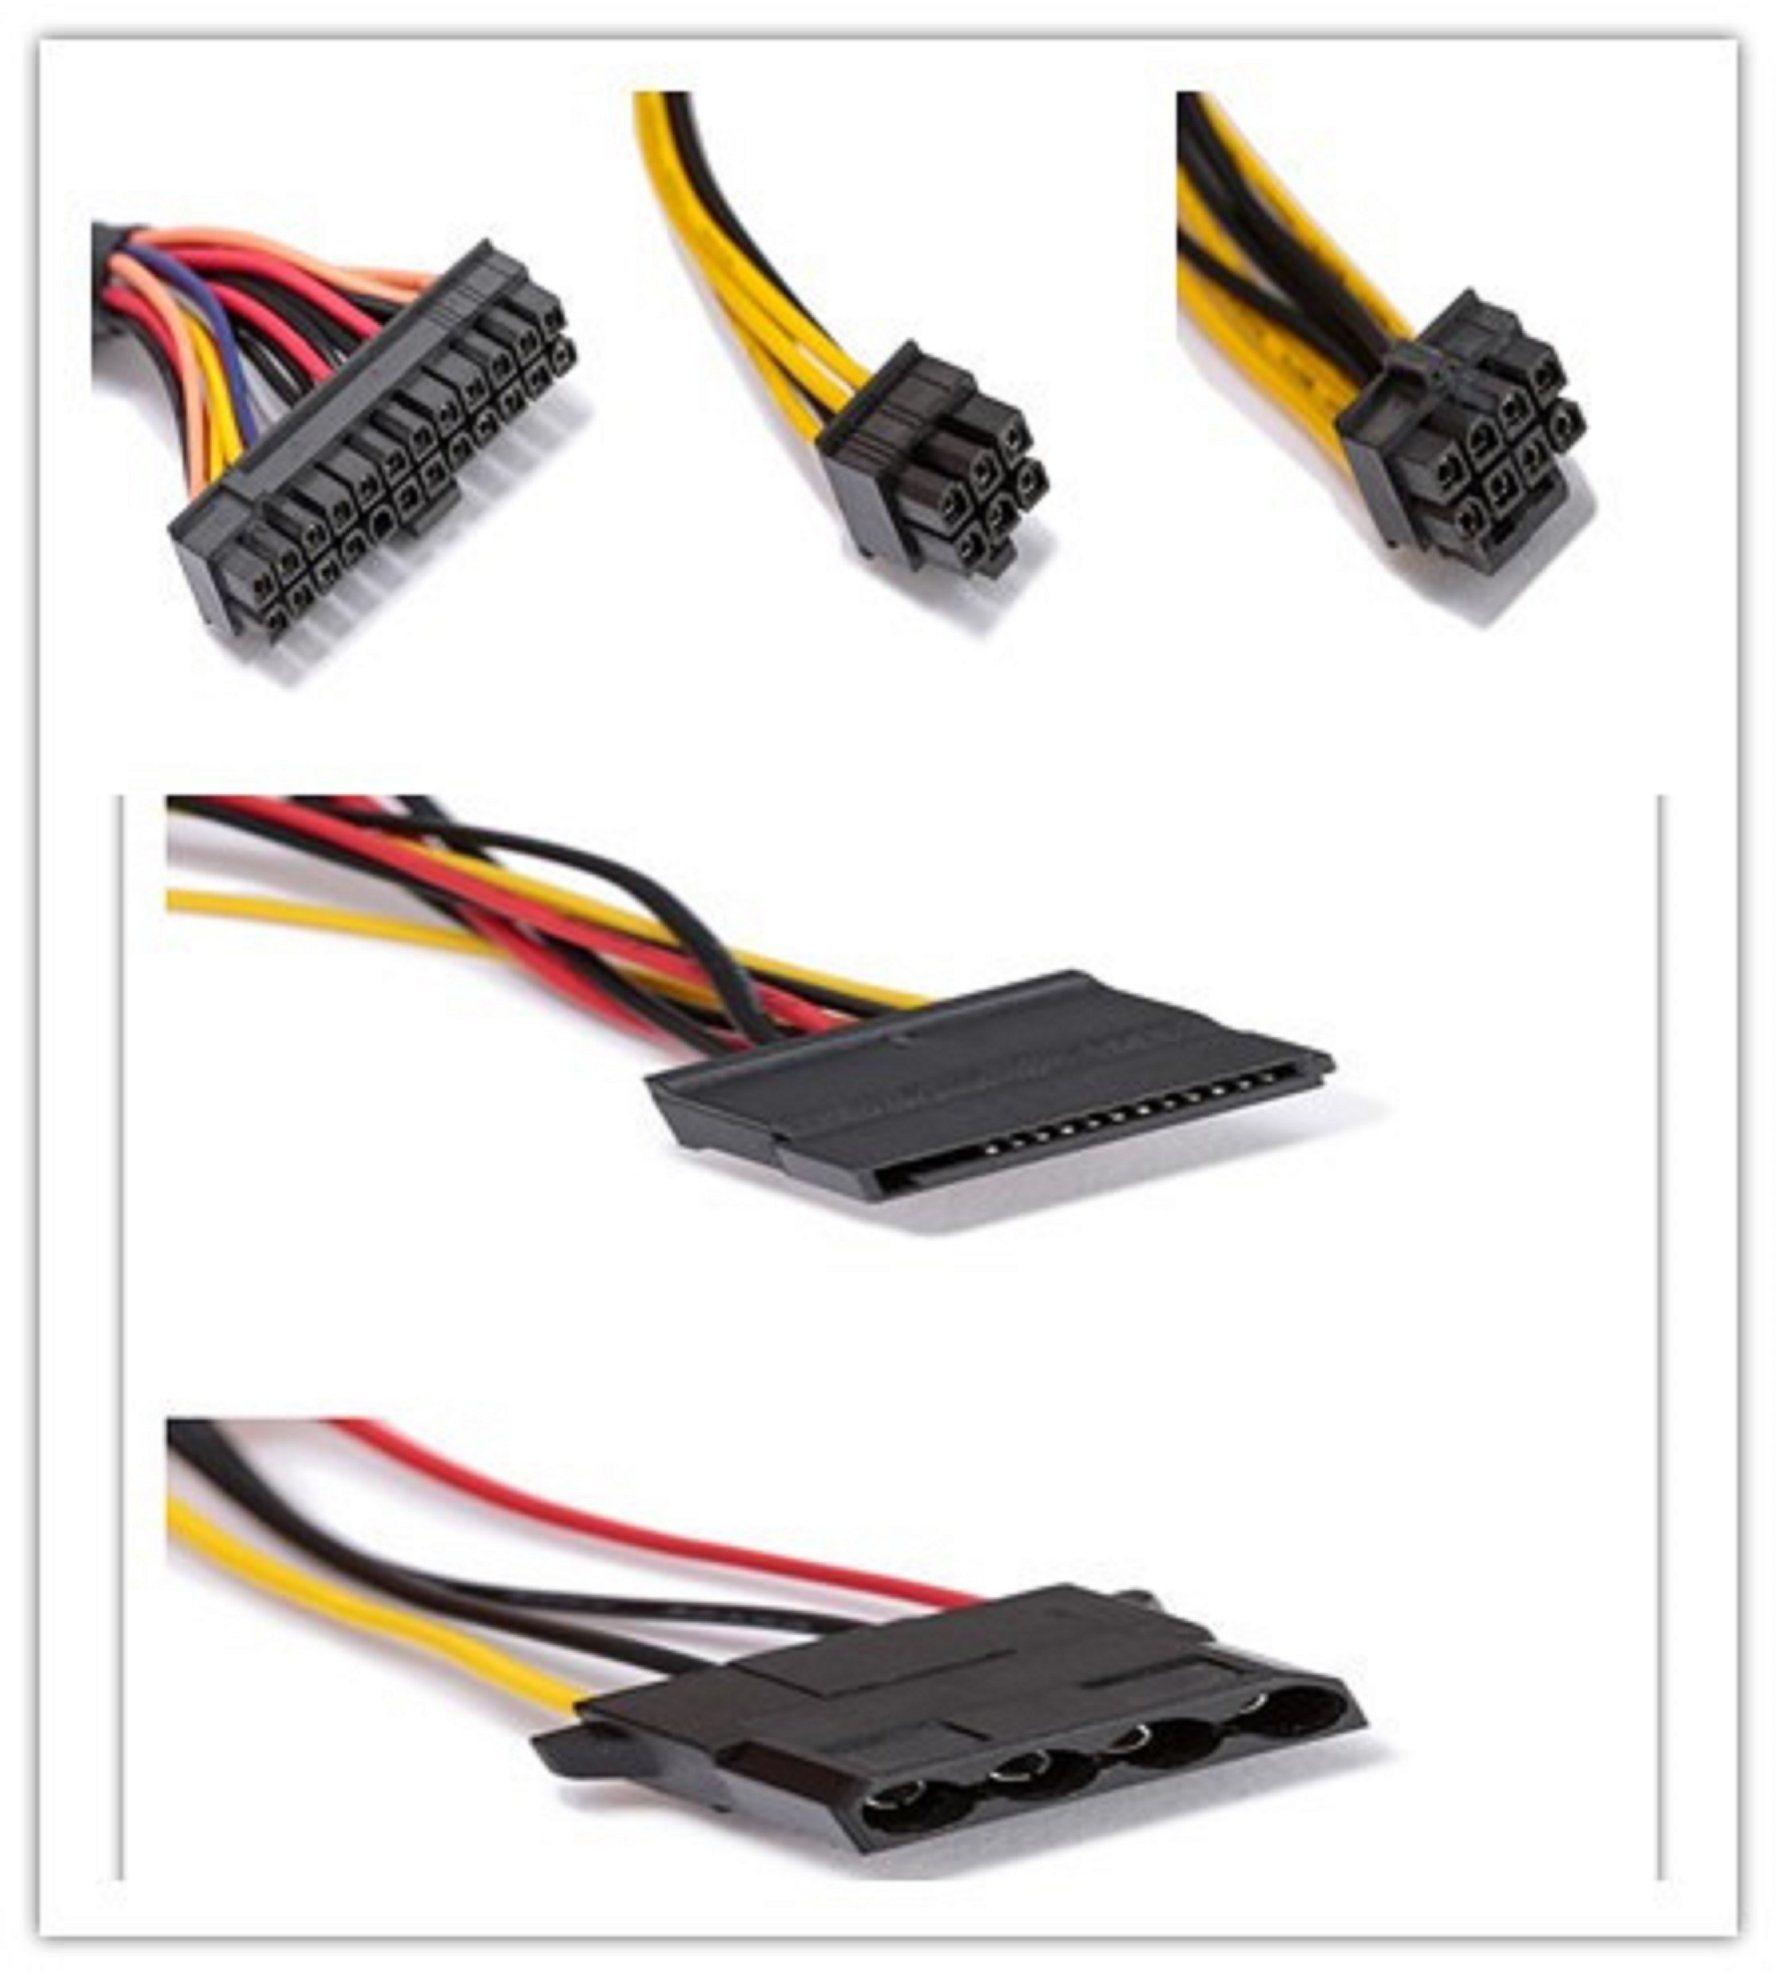 China 2017 Hot Sales Free Sample Switching PC Power Supply ATX ...